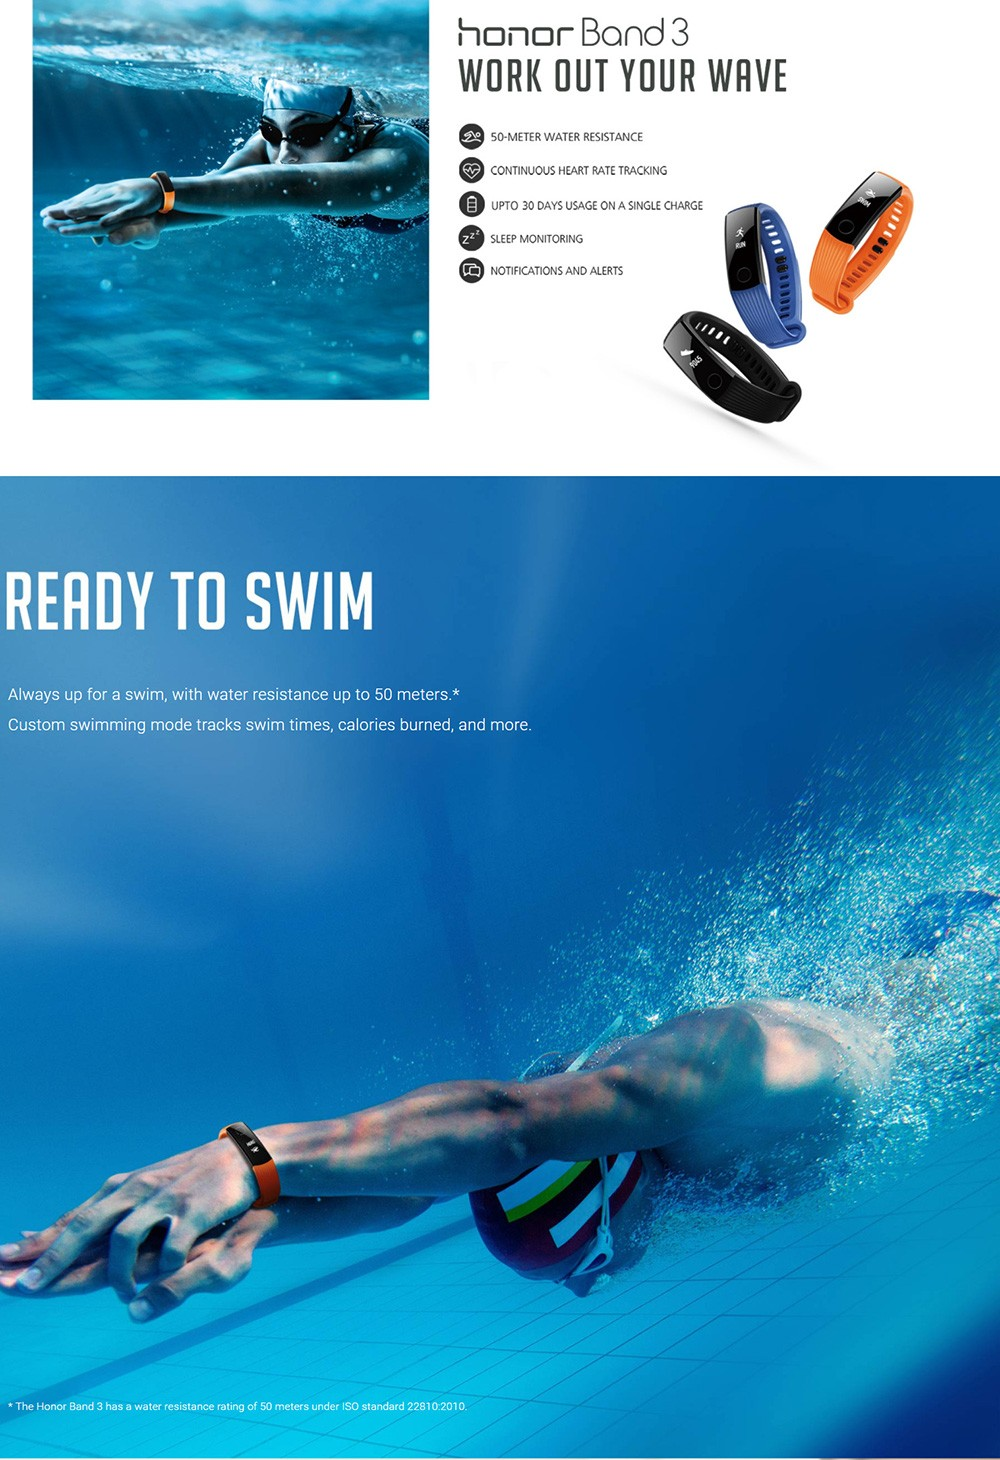 Huawei-Honor-Band-3 商品画像 水泳